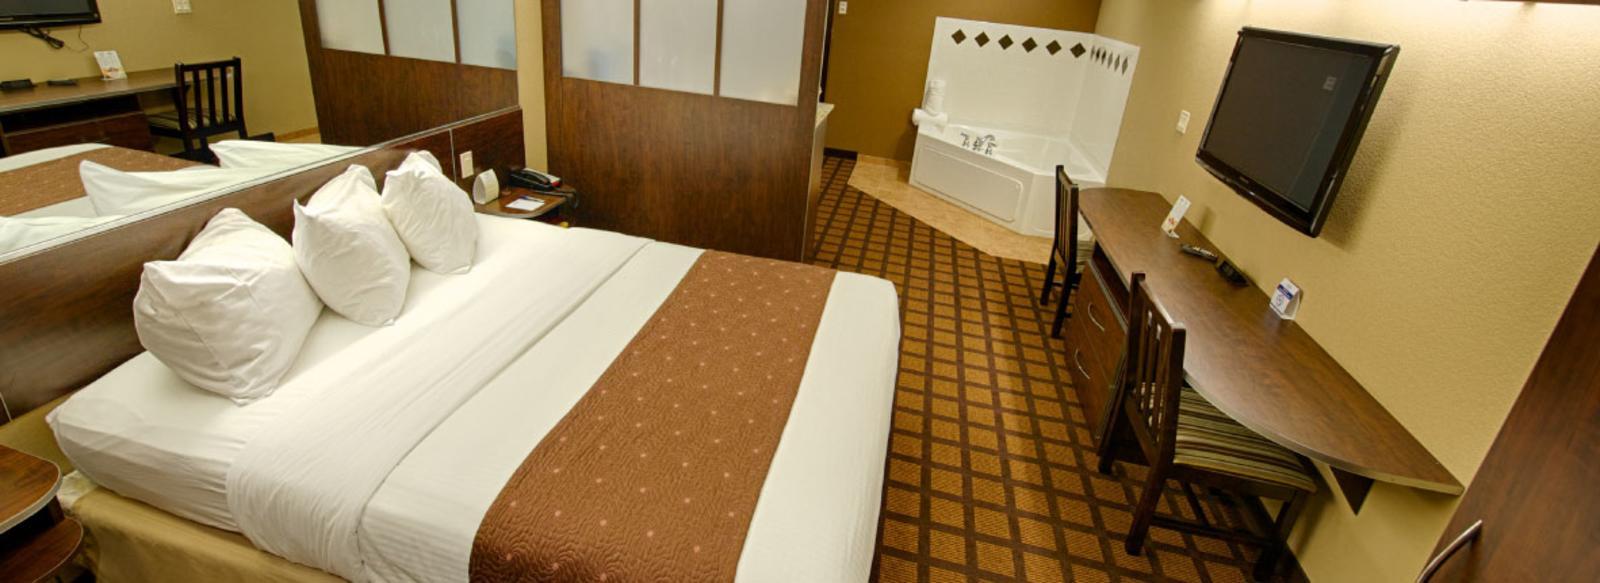 Microtel-Hotel-Michigan-City-Indiana-South-Shore-Hotels